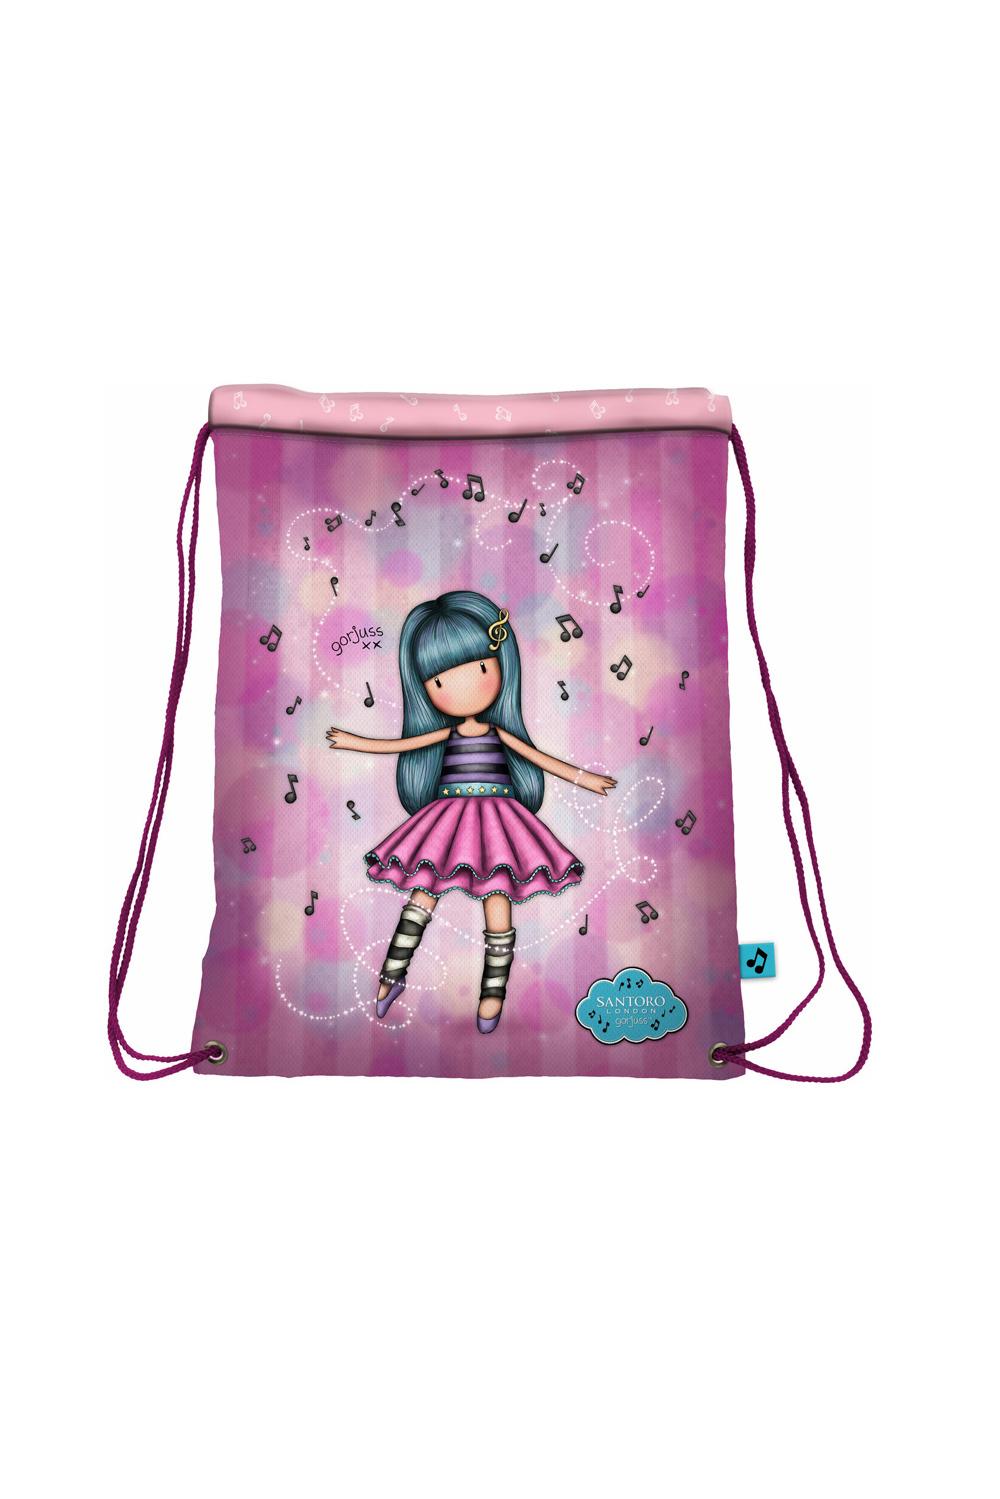 Santoro roza zatezna vrečka z vrvico Gorjuss Dancing Among The Stars